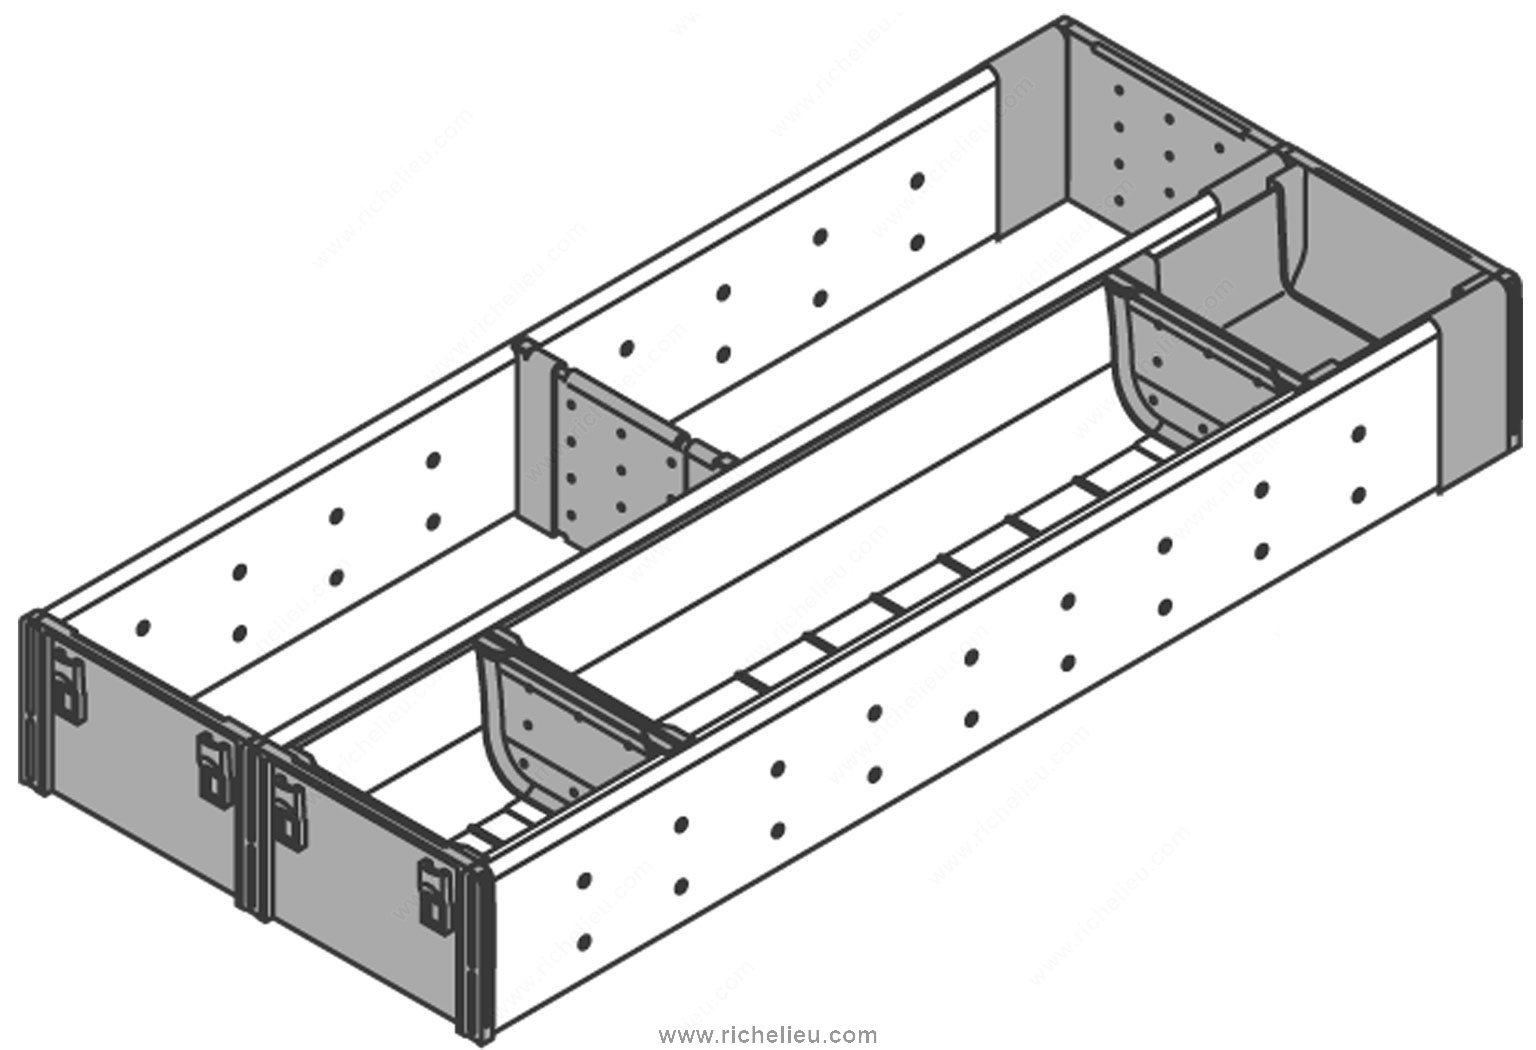 range couverts et casier ustensile pour tiroir en bois. Black Bedroom Furniture Sets. Home Design Ideas